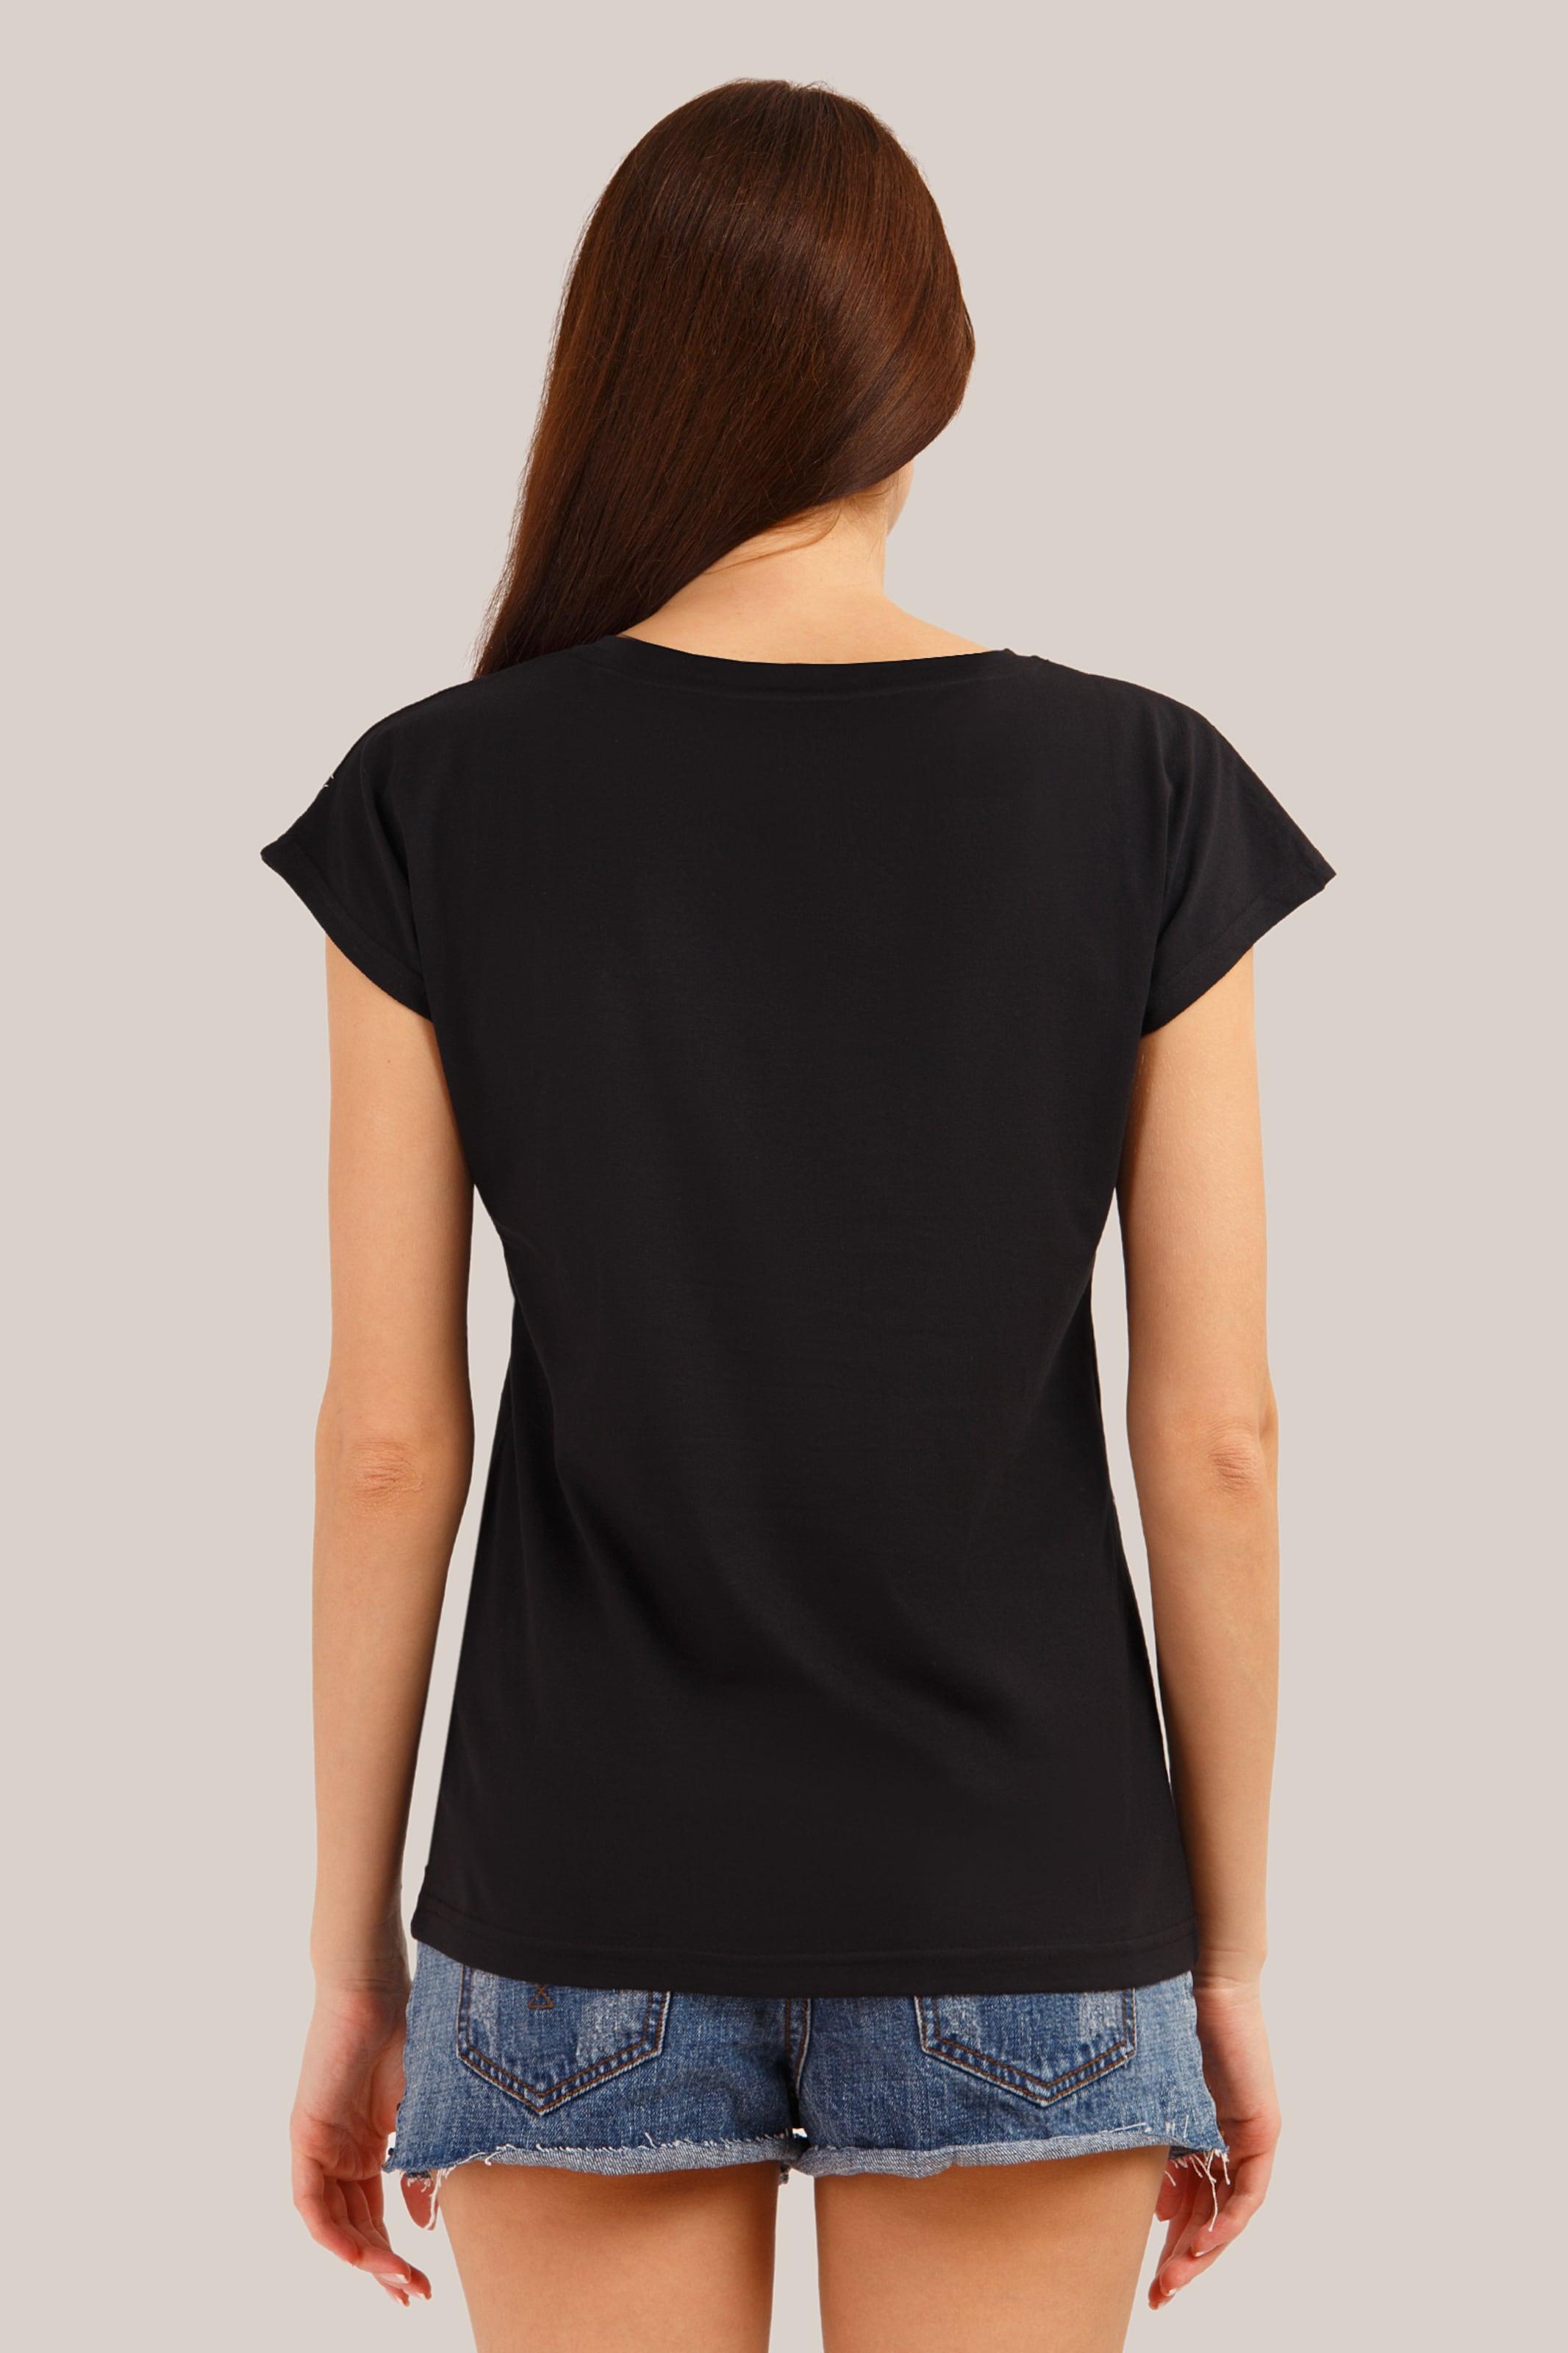 Schwarz Flare In Finn T shirt lcu1TKJF3